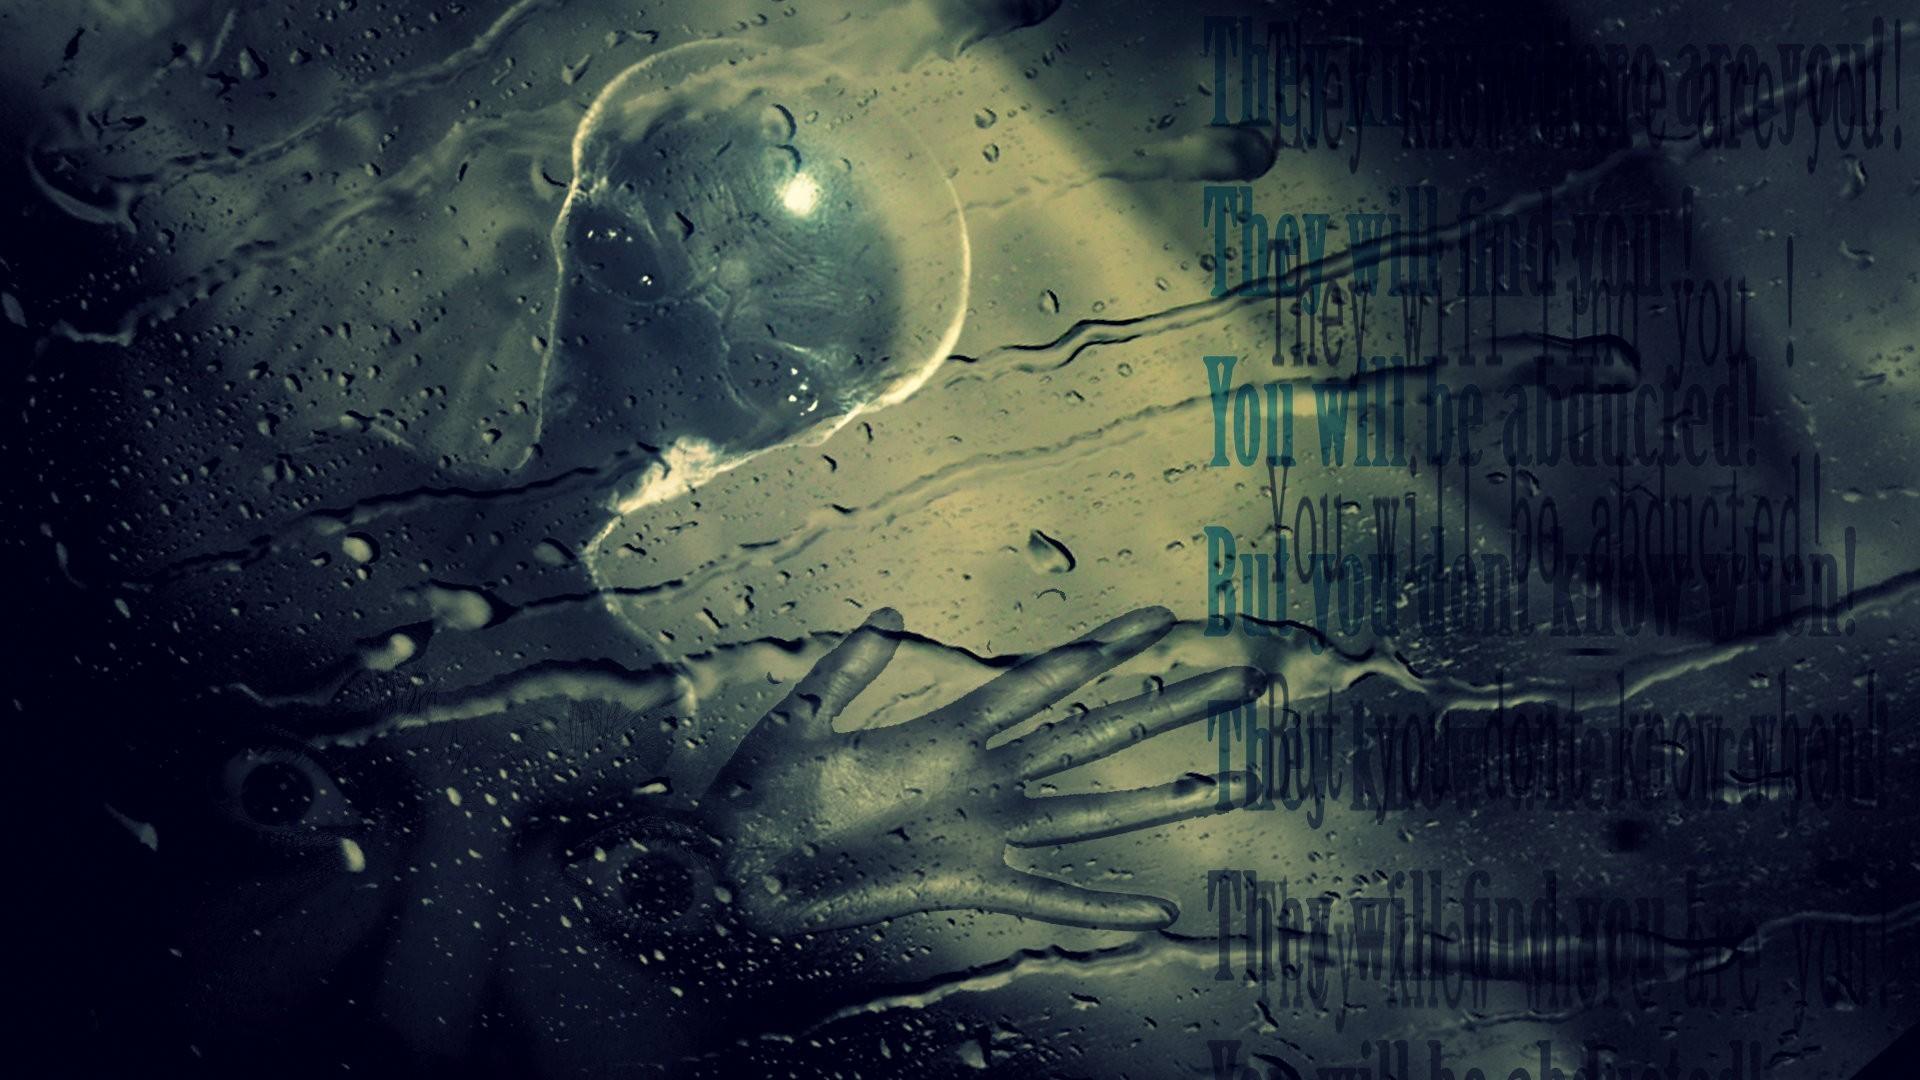 Alien abduction hypno wallpaper WallpaperFool 1920x1080